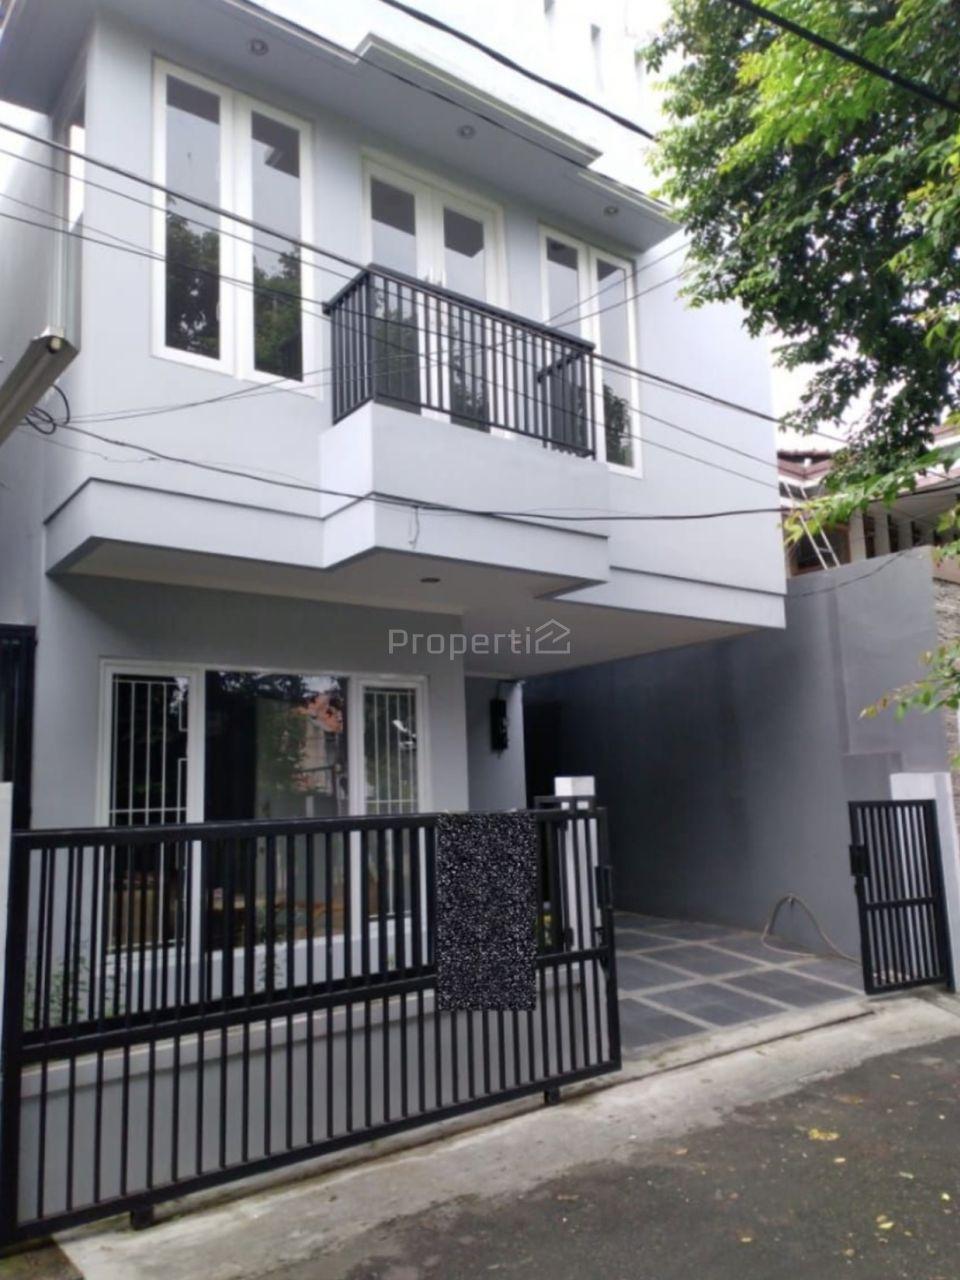 Rumah Baru di Tebet Barat, DKI Jakarta